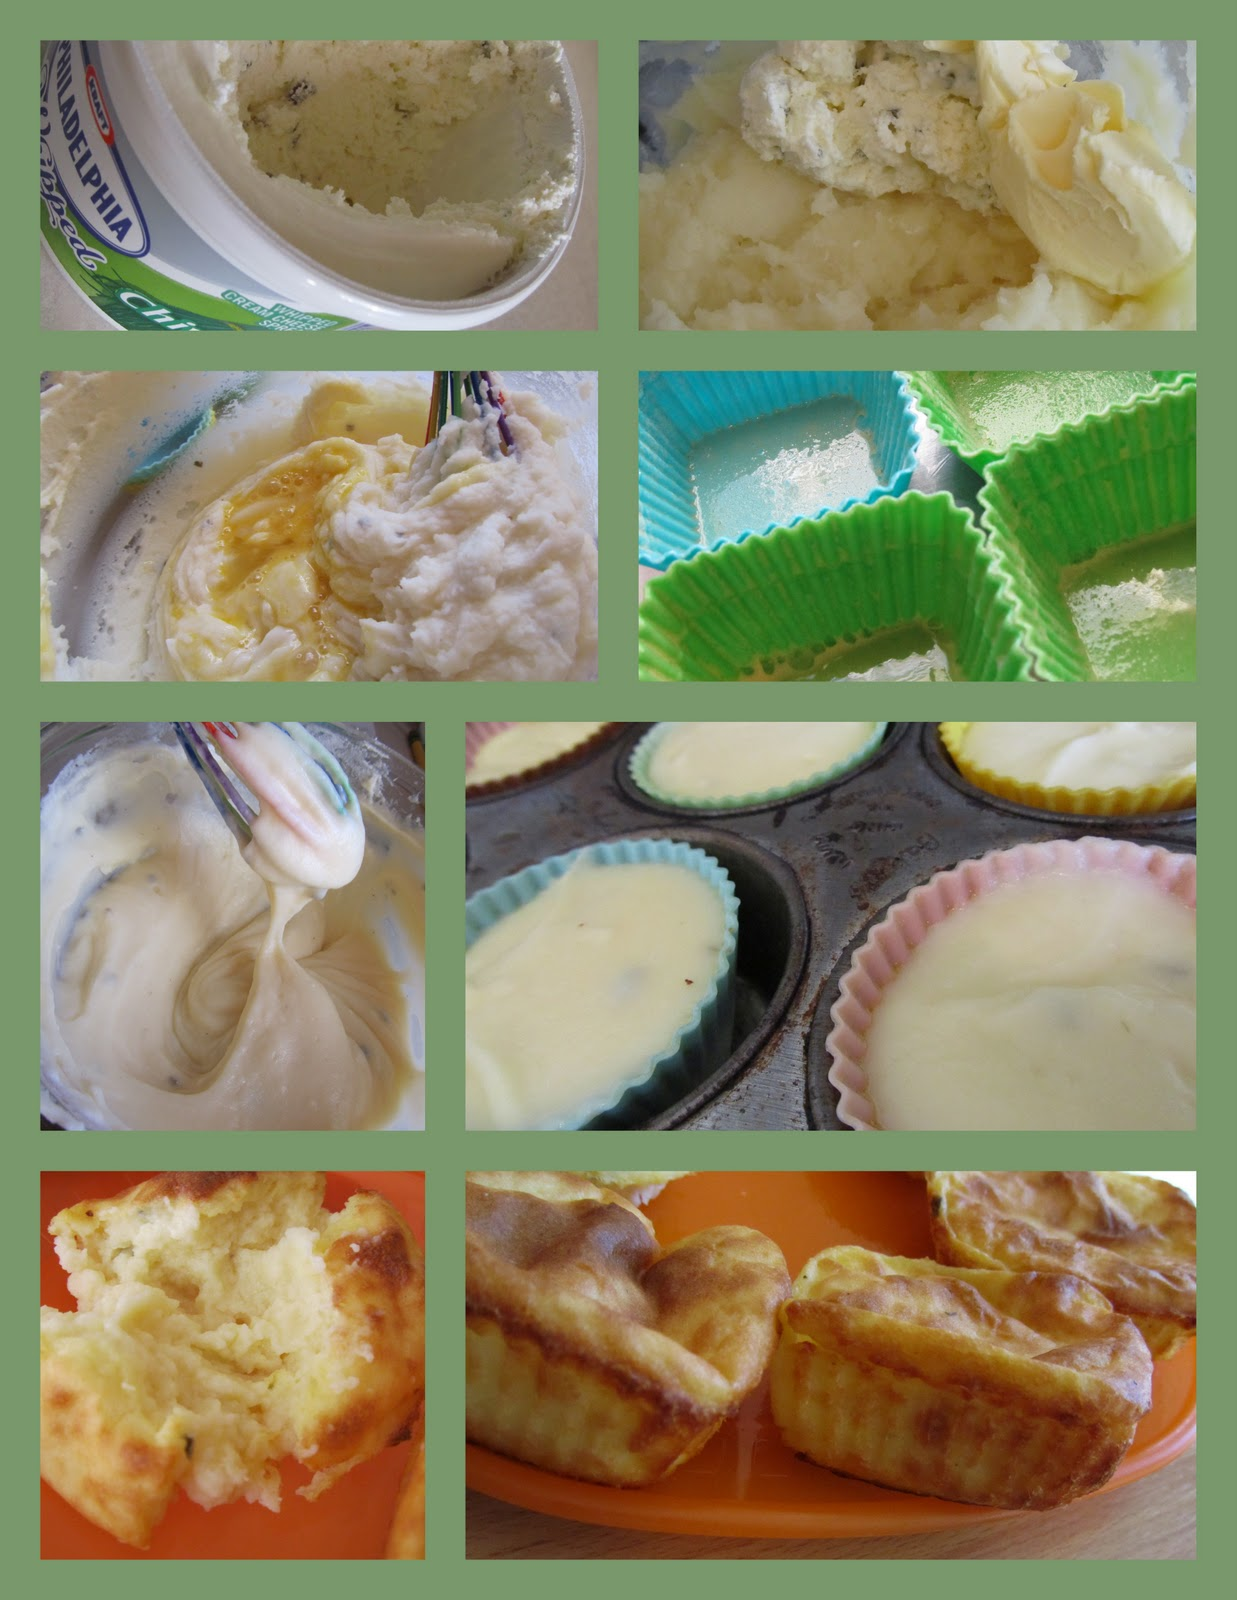 round 1 mashed potato puffs cupcakes round 2 mashed potato puffs tots